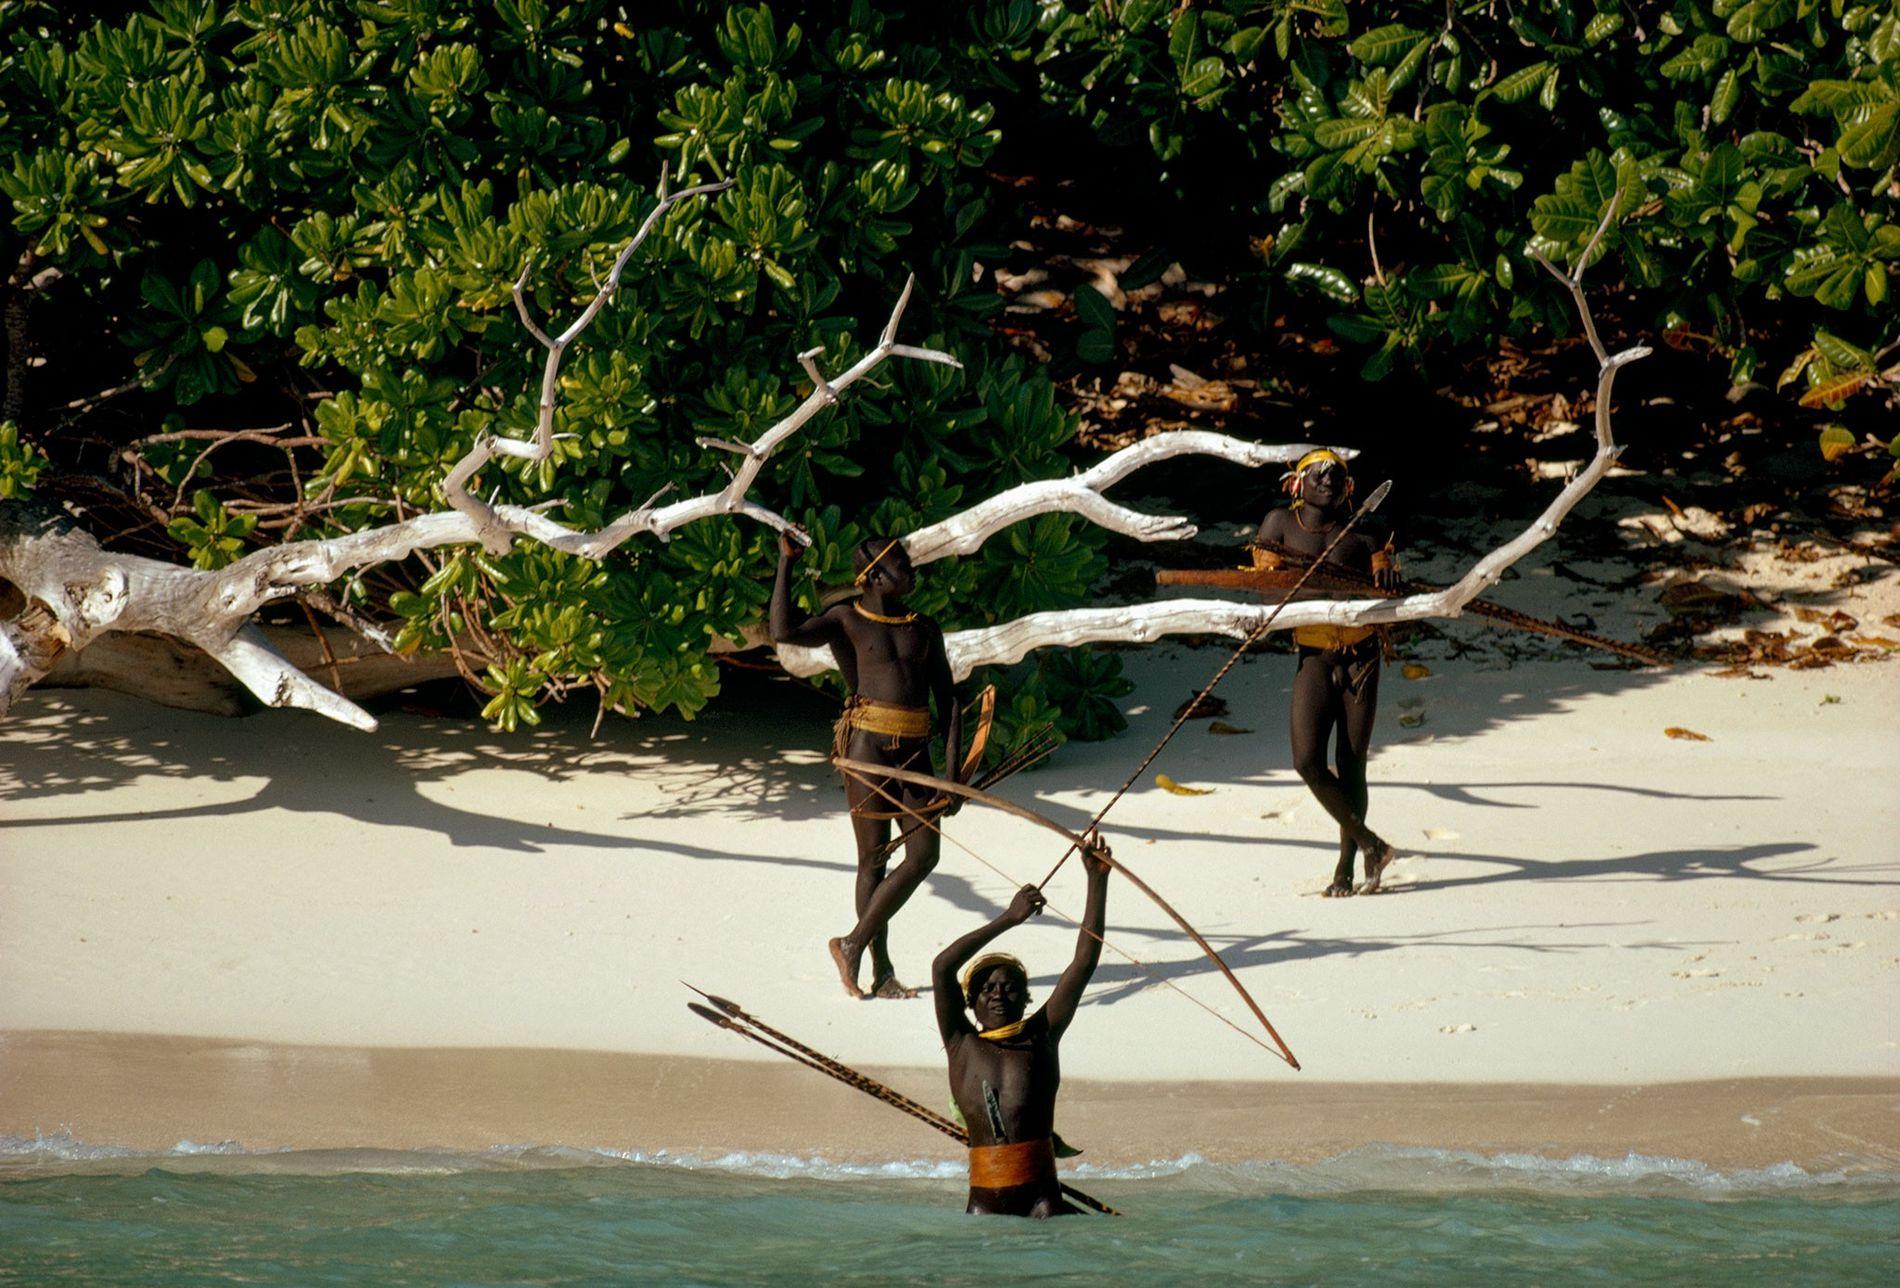 La tribuSentinelese (Islas Andaman)